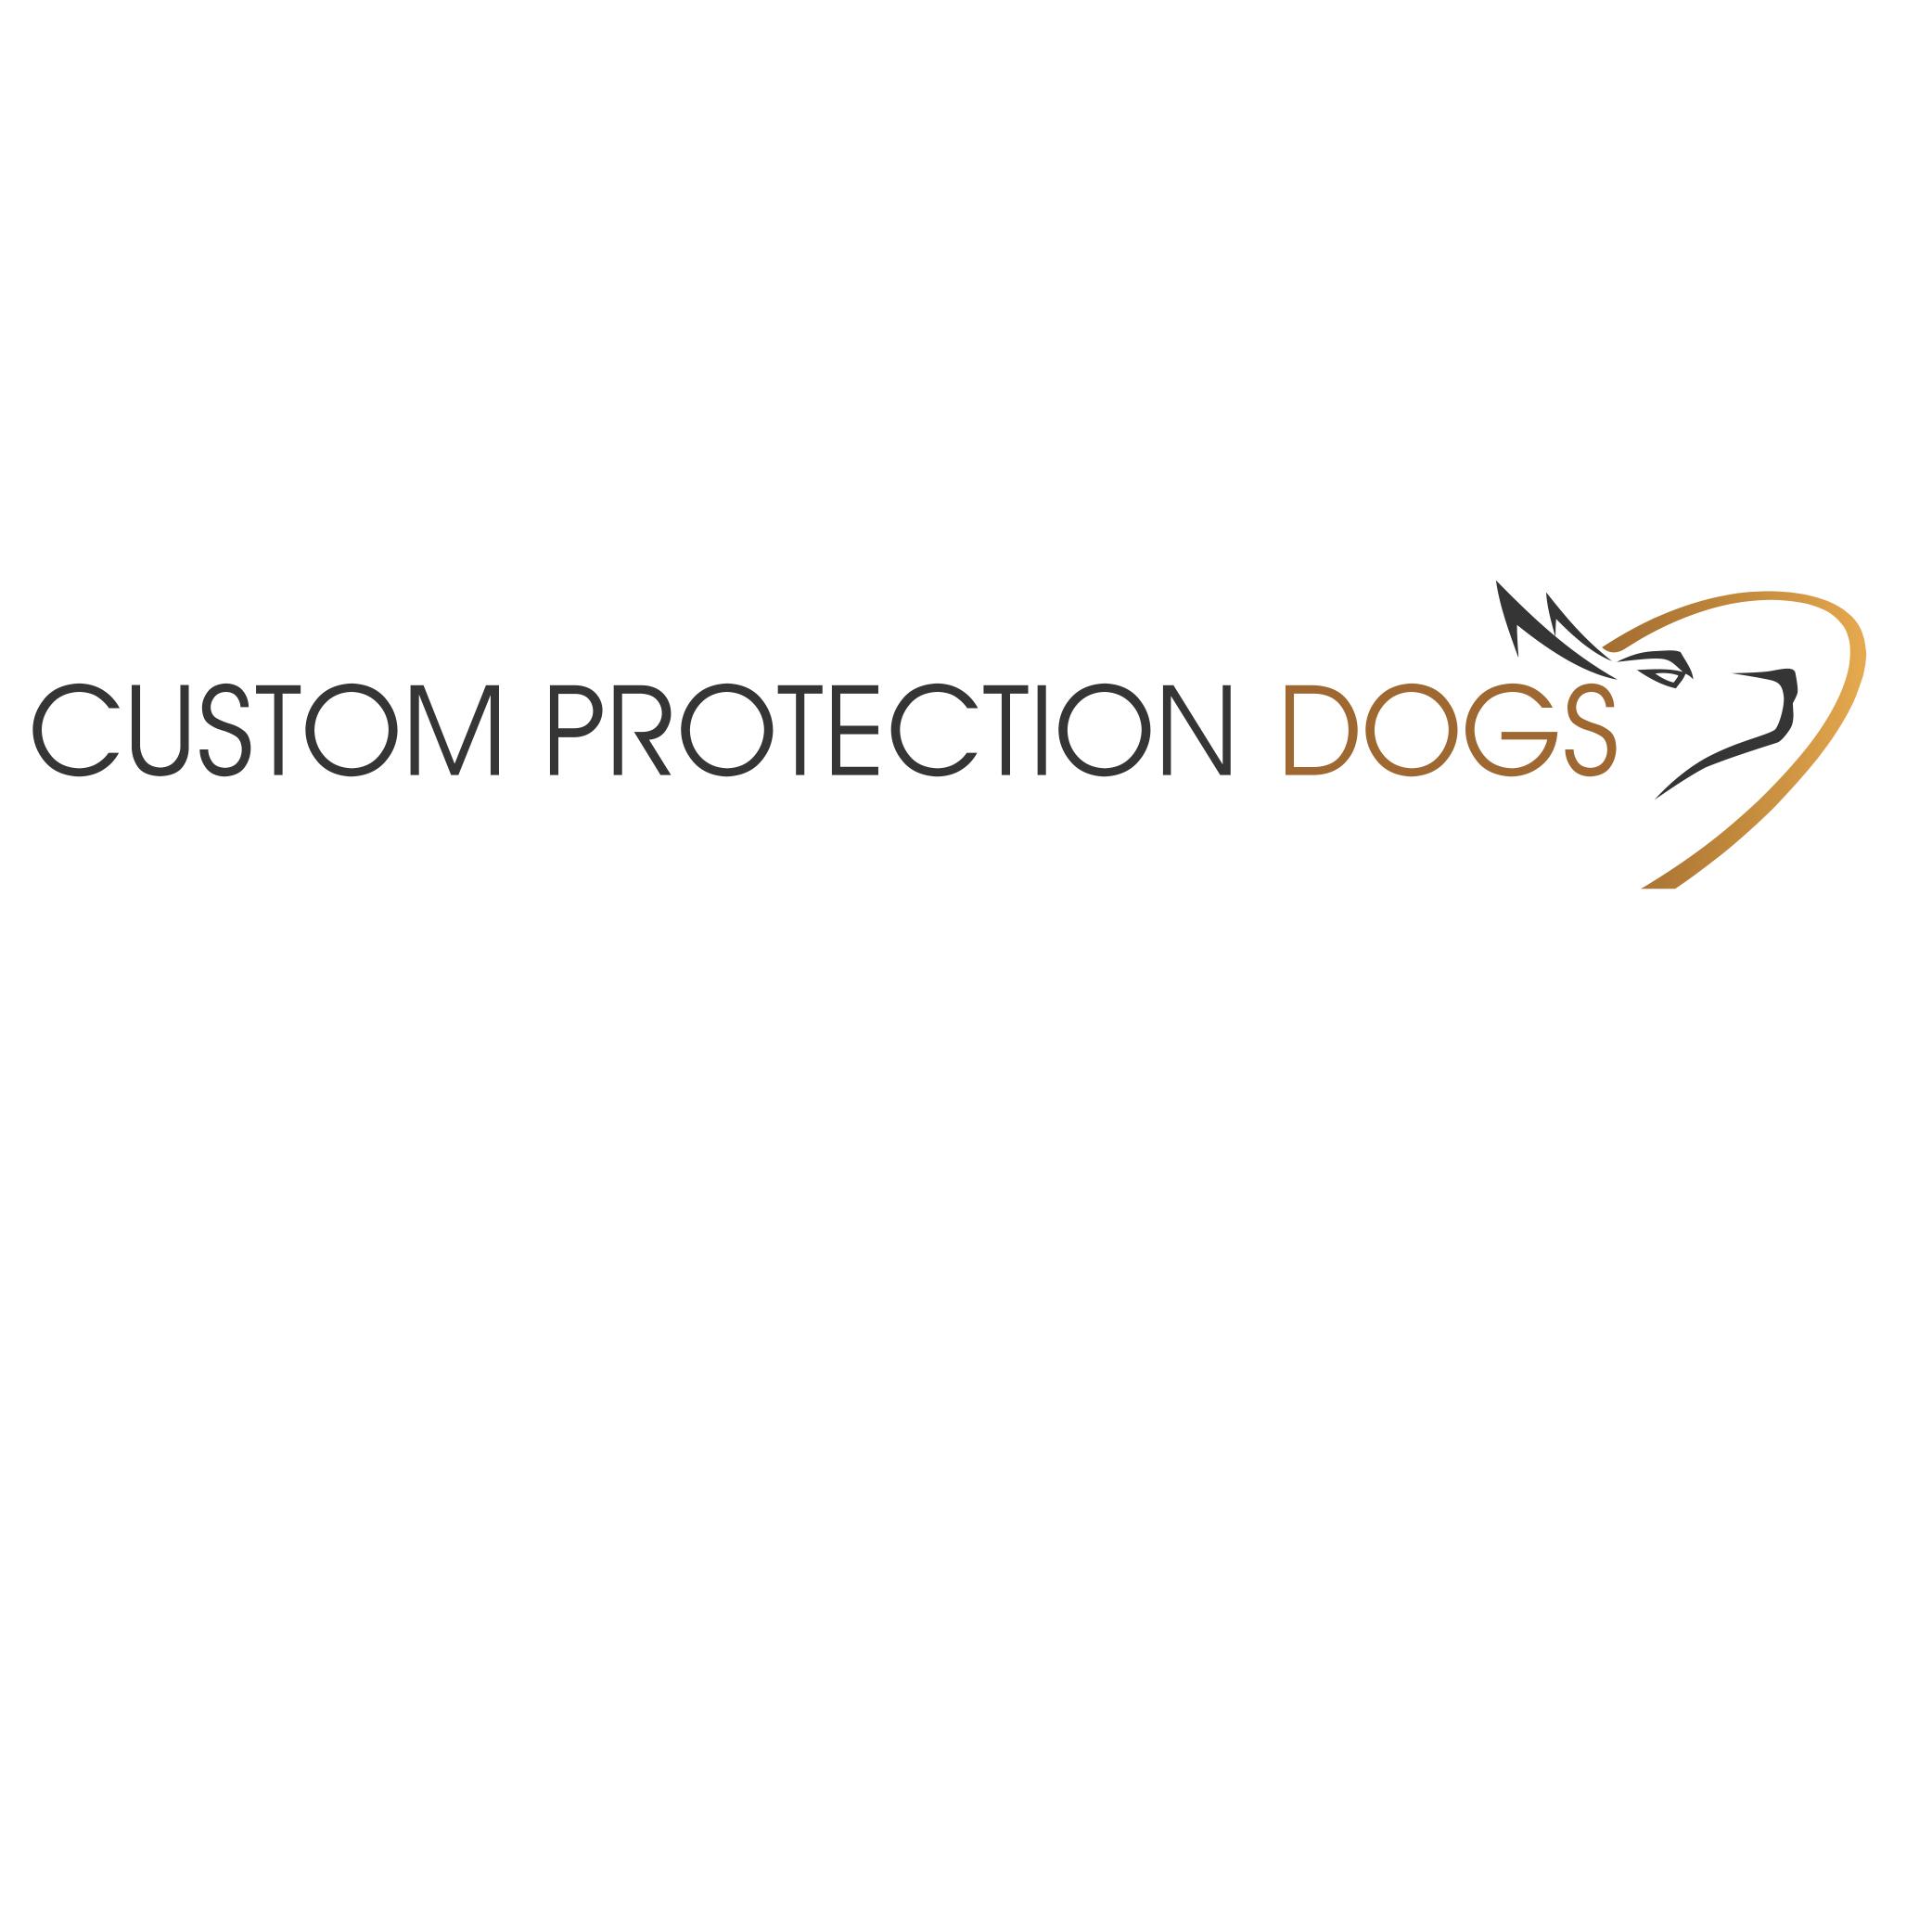 Custom Protection Dogs